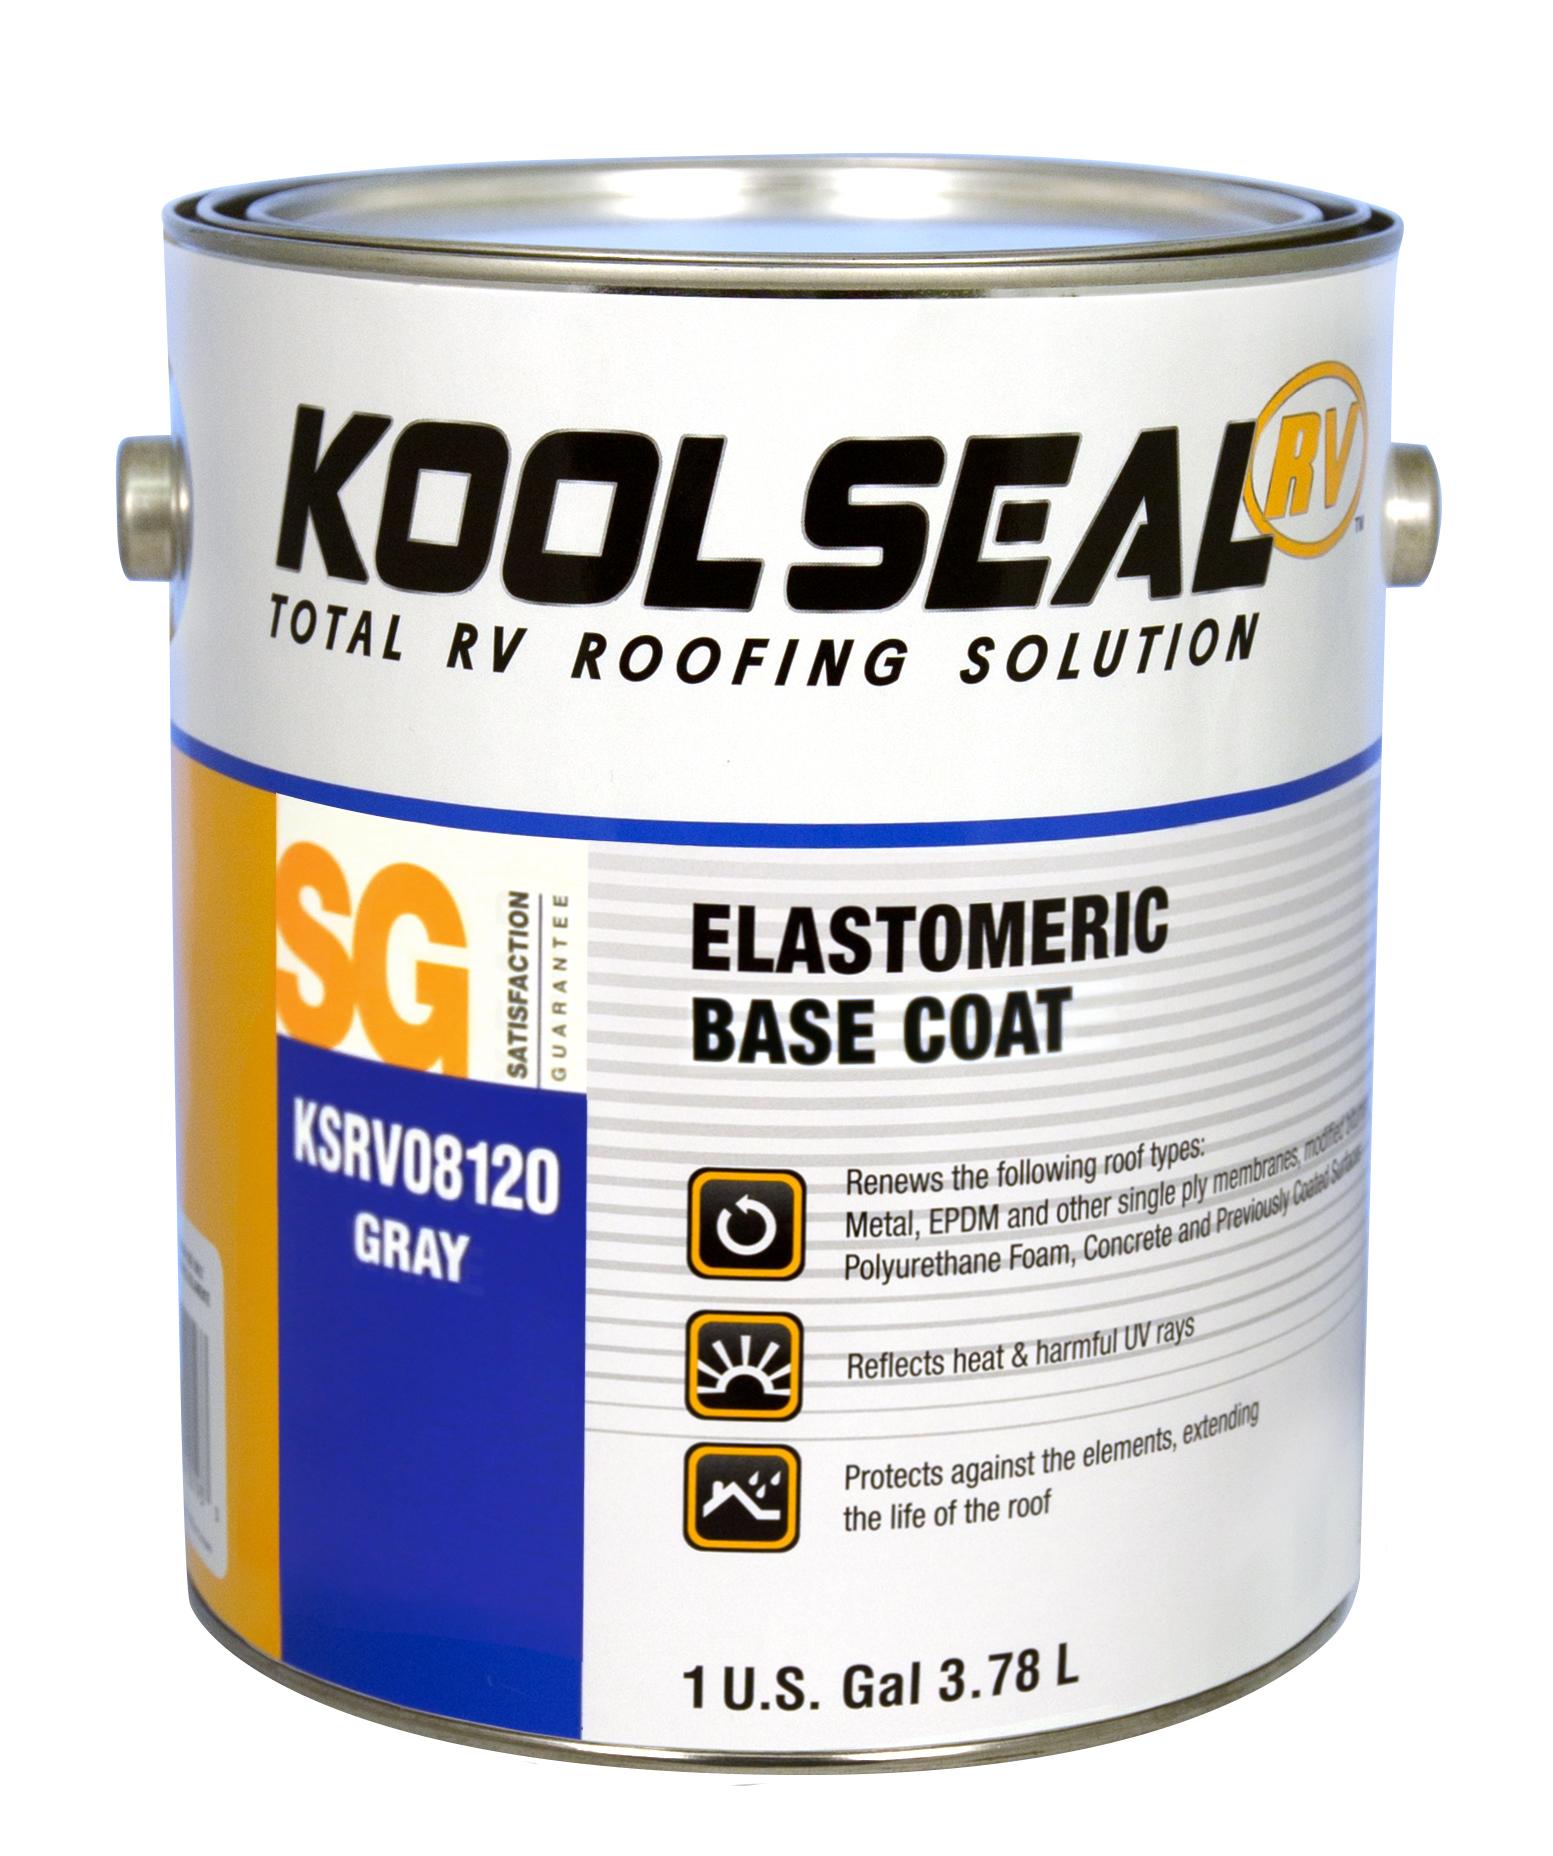 Elastomeric Rv Base Coat Koolseal